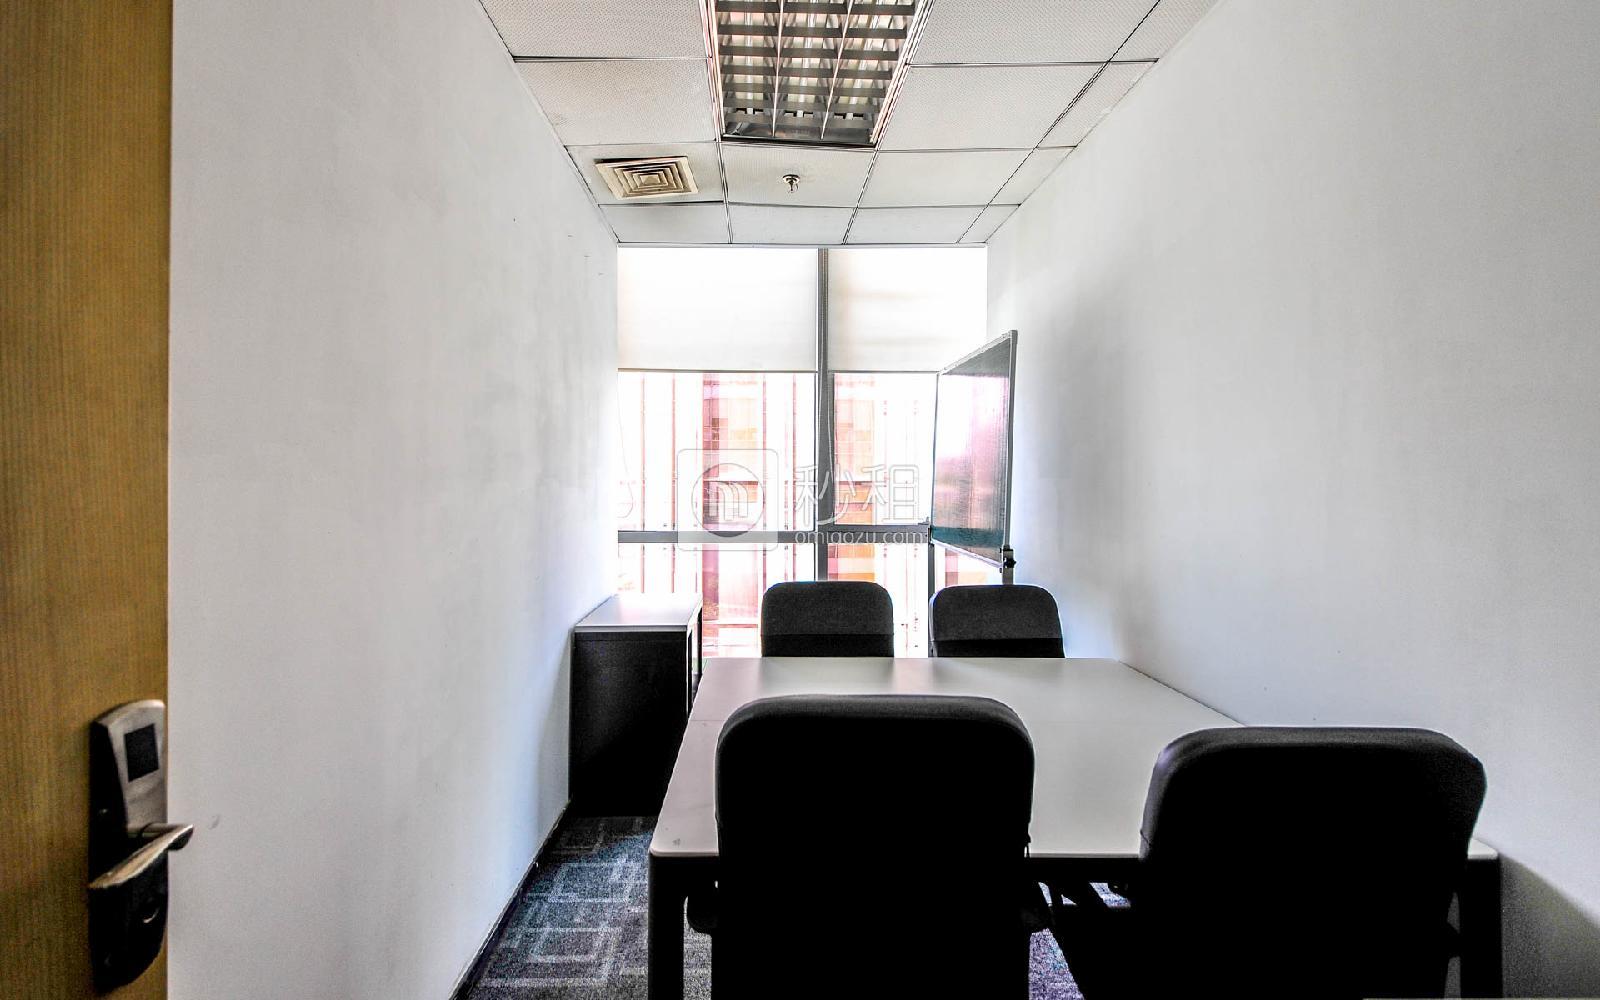 CBD国际大厦-世鳌国际商务中心写字楼出租20平米精装办公室10400元/间.月